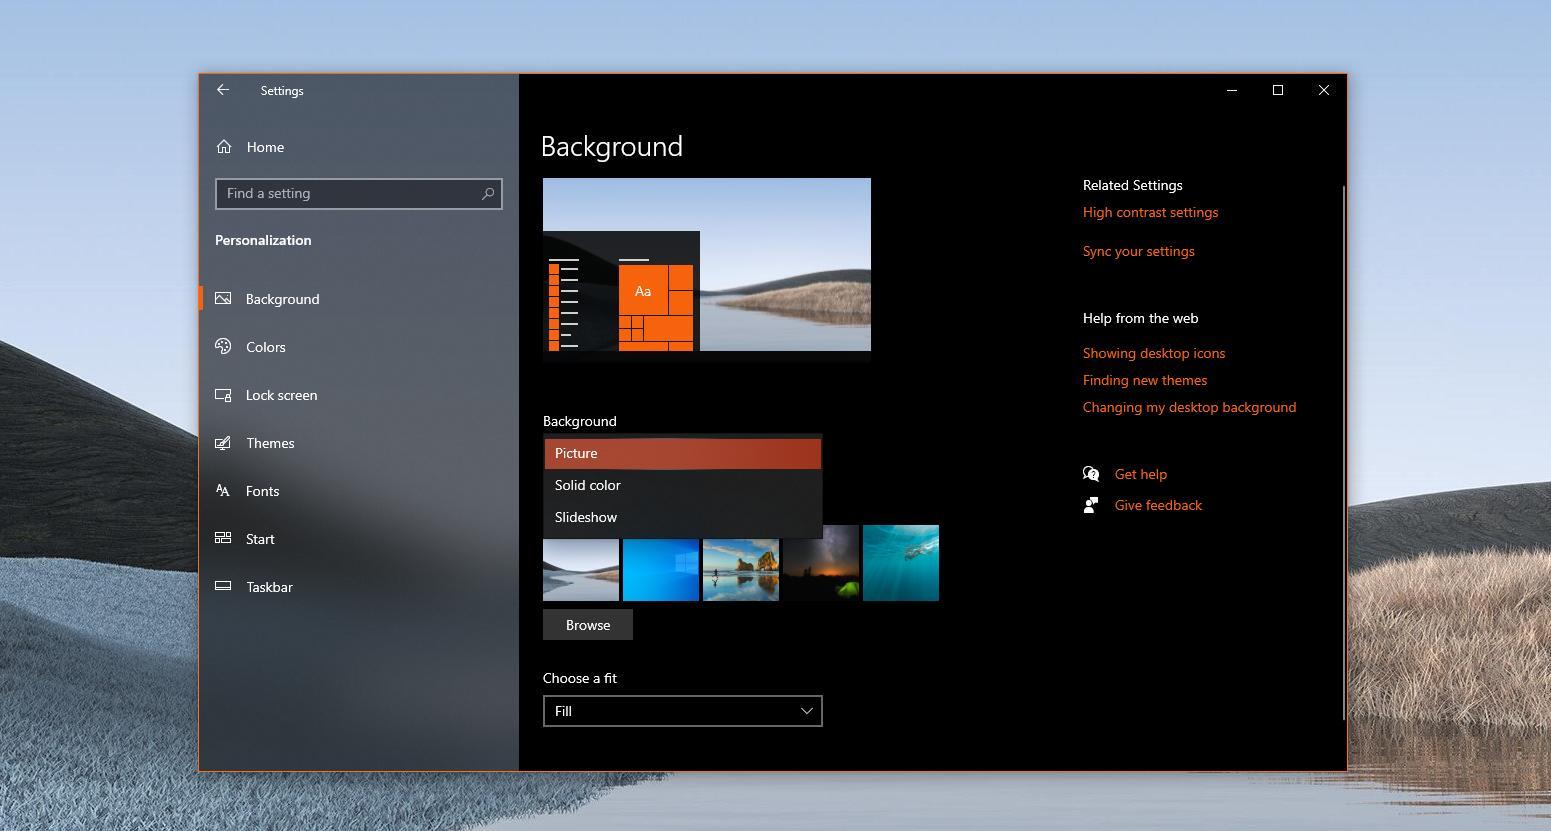 Windows 10 desktop background options